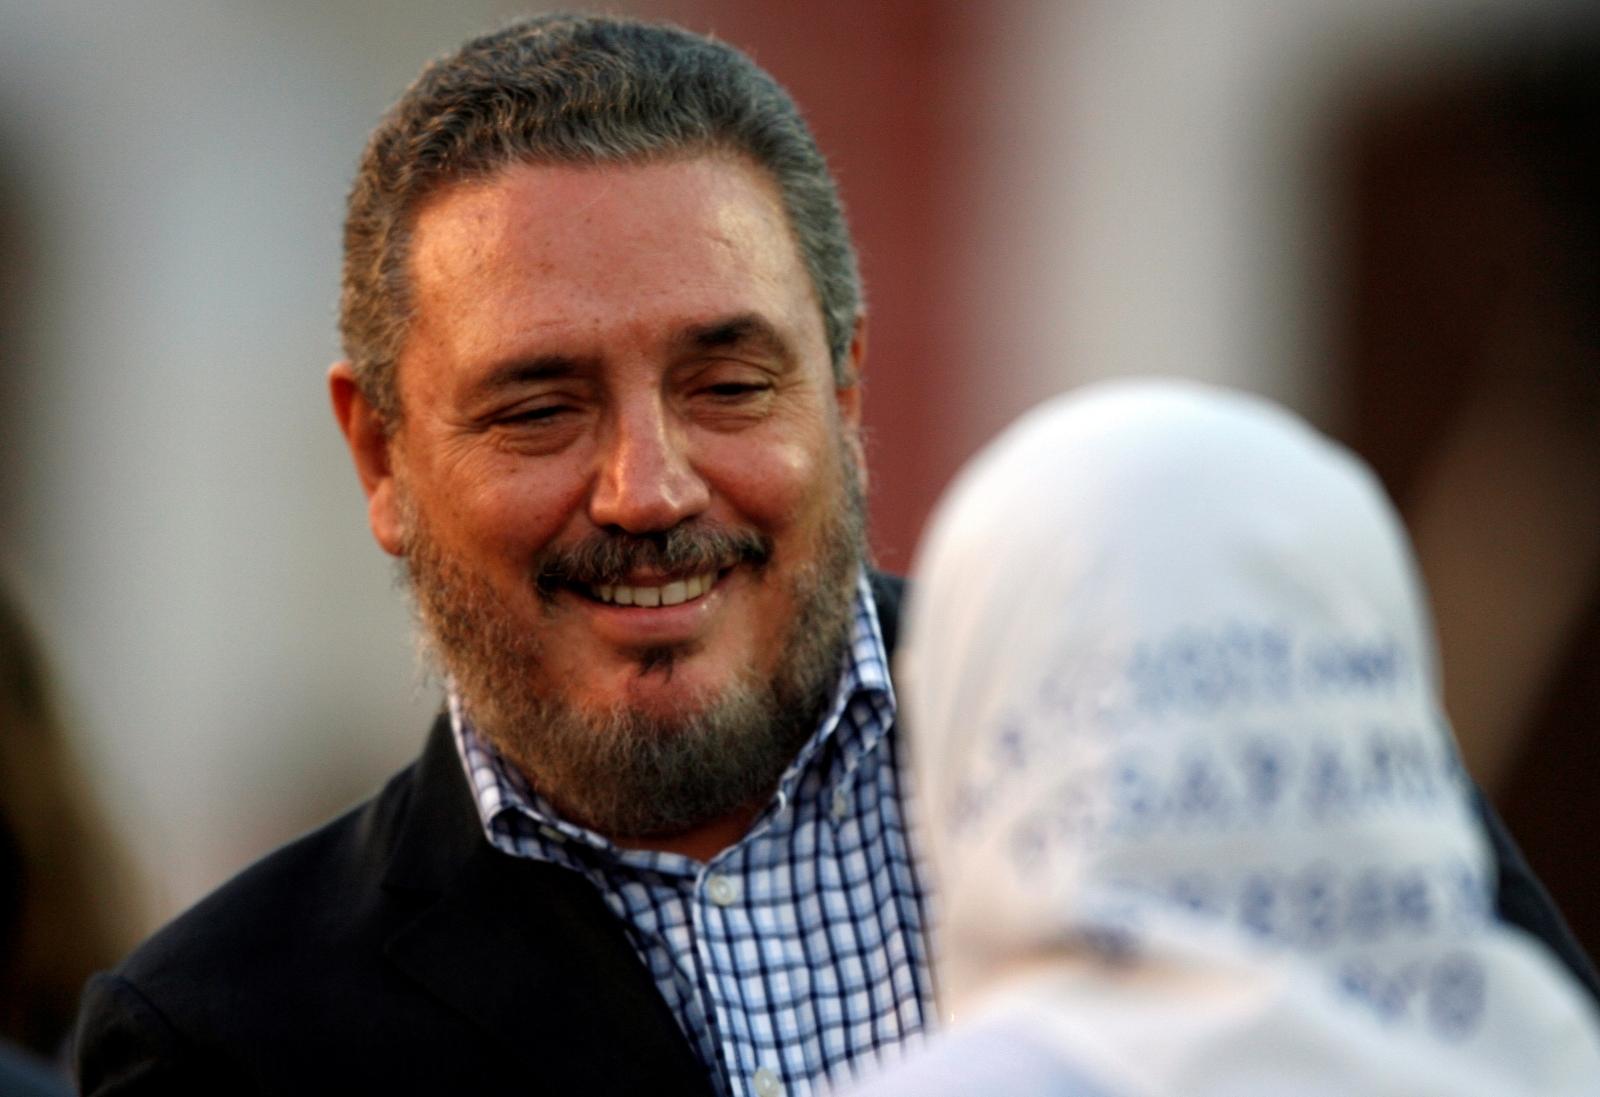 Fidel Castro eldest son